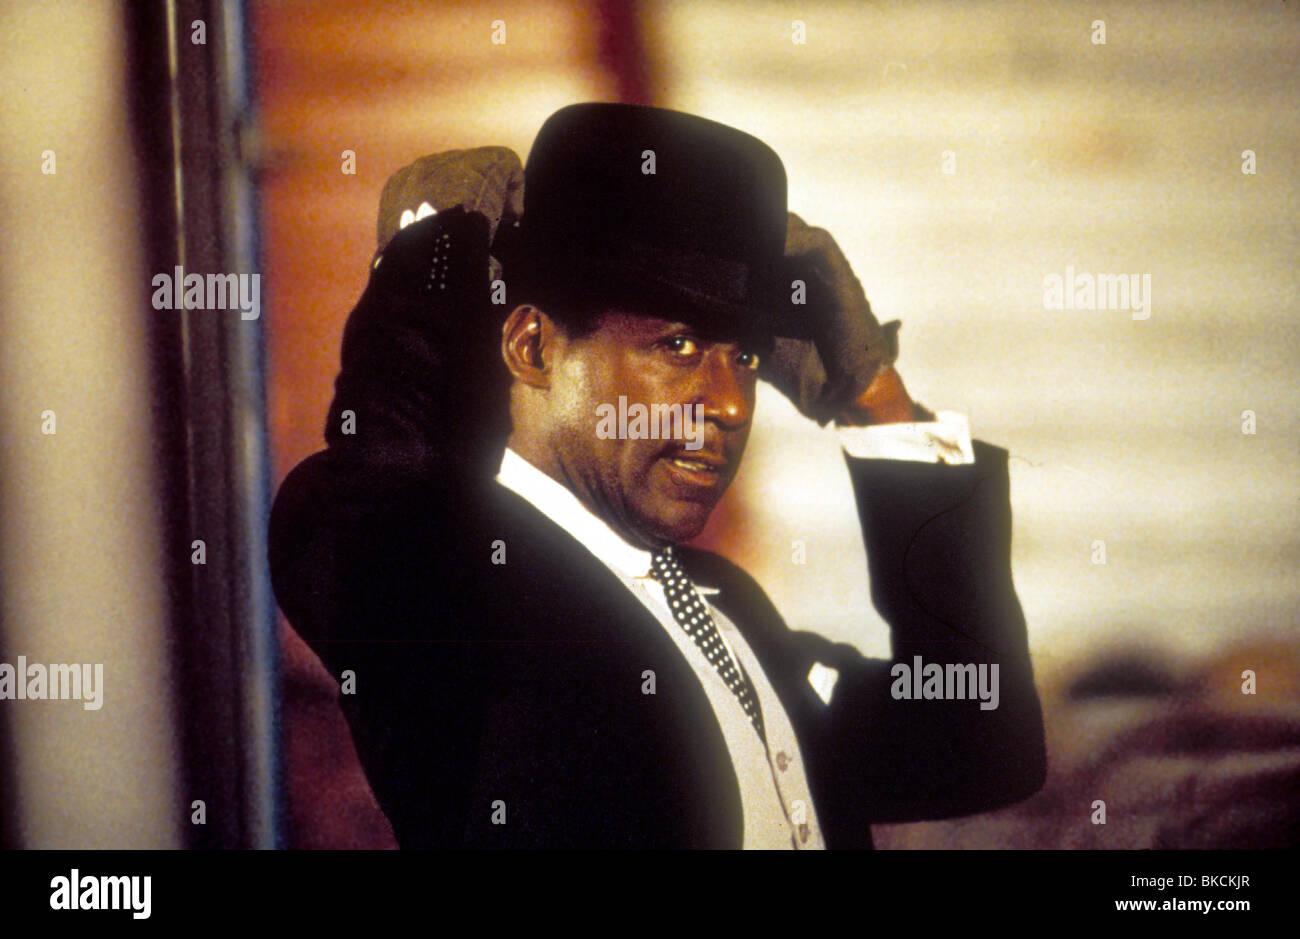 CITY HEAT (1984) RICHARD ROUNDTREE CIH 029 - Stock Image